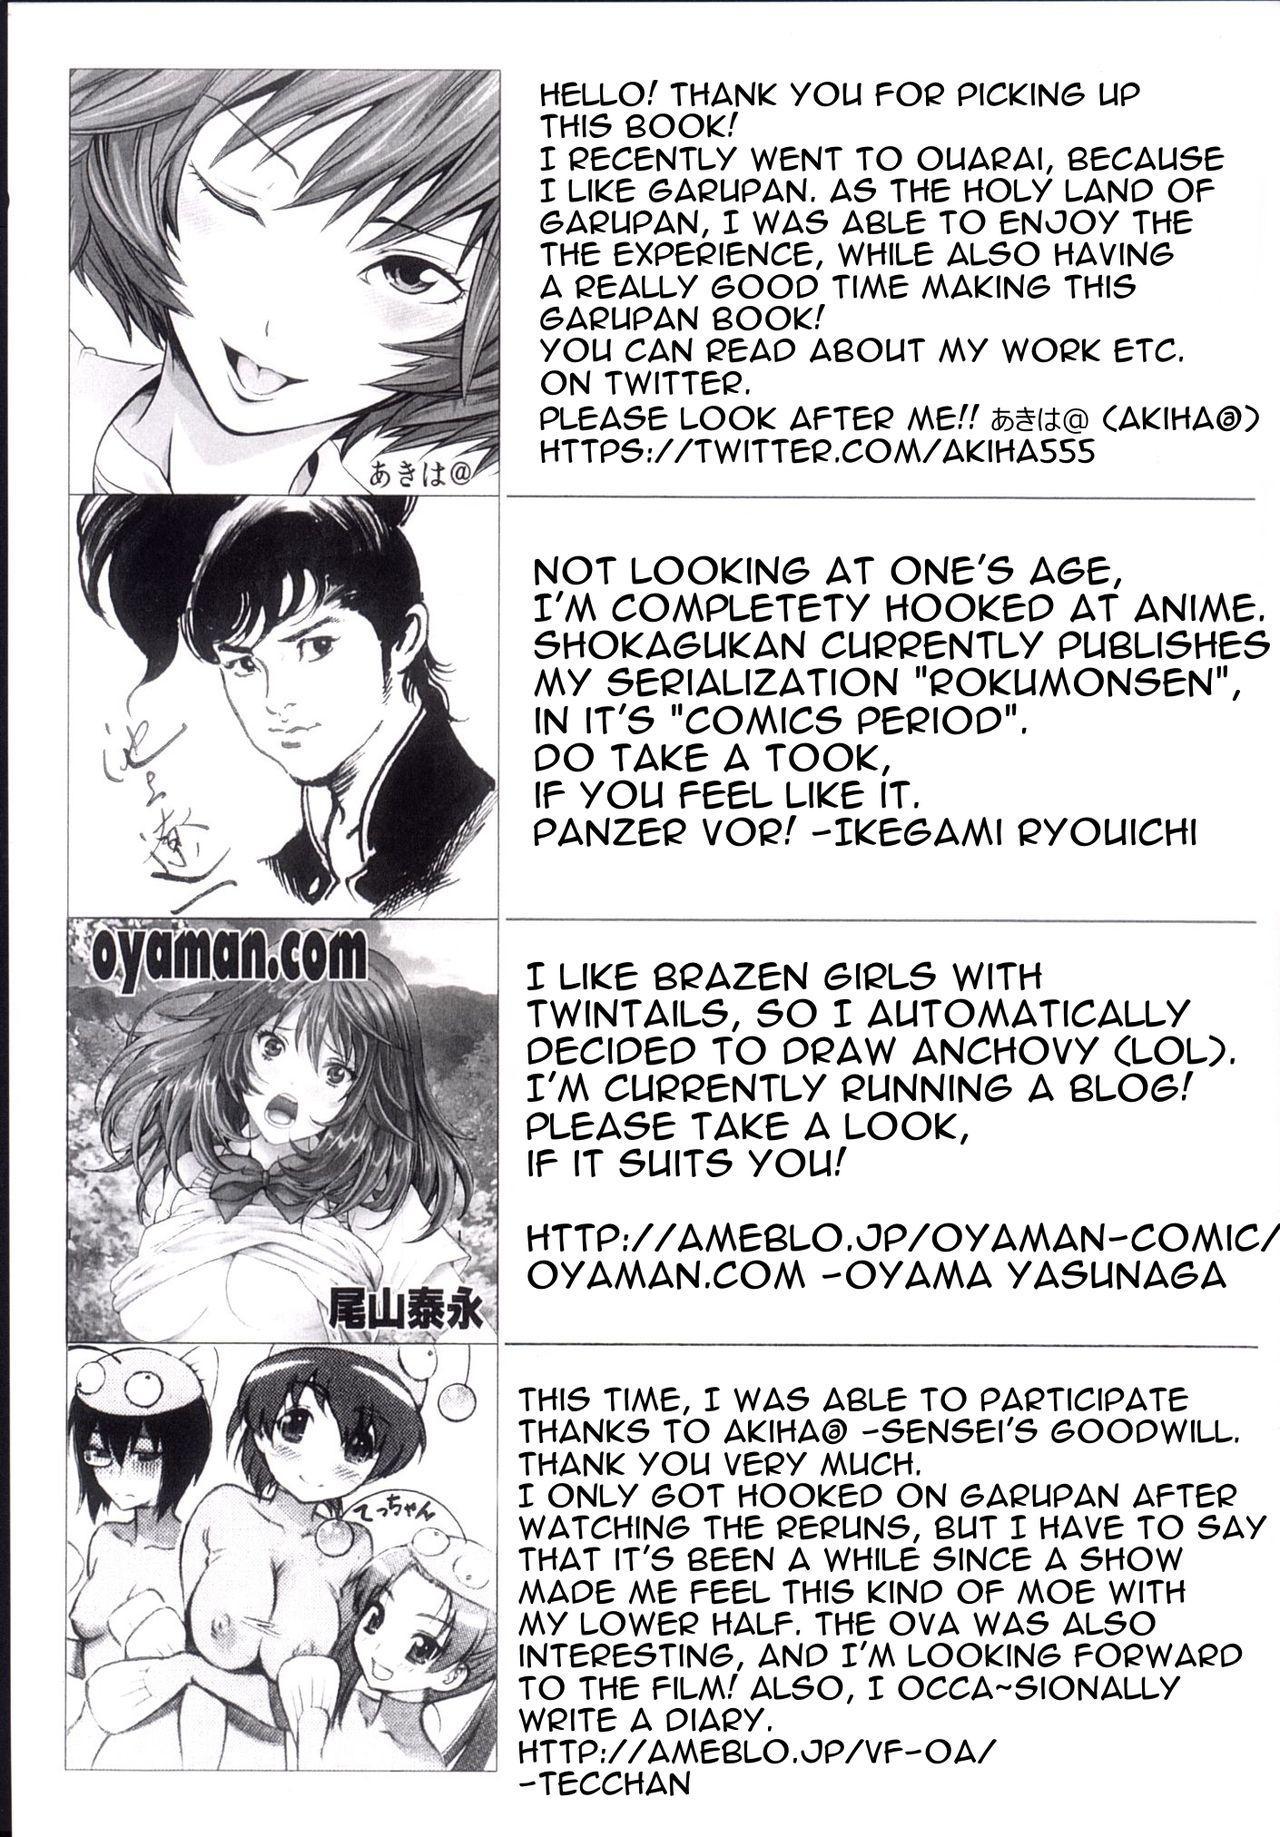 Senshadou no Musumetachi ga Hiwai na Bitch ni Shiagarimashita | The Daughters of The Tank Way Were Finished in Indecent Bitsch. 19